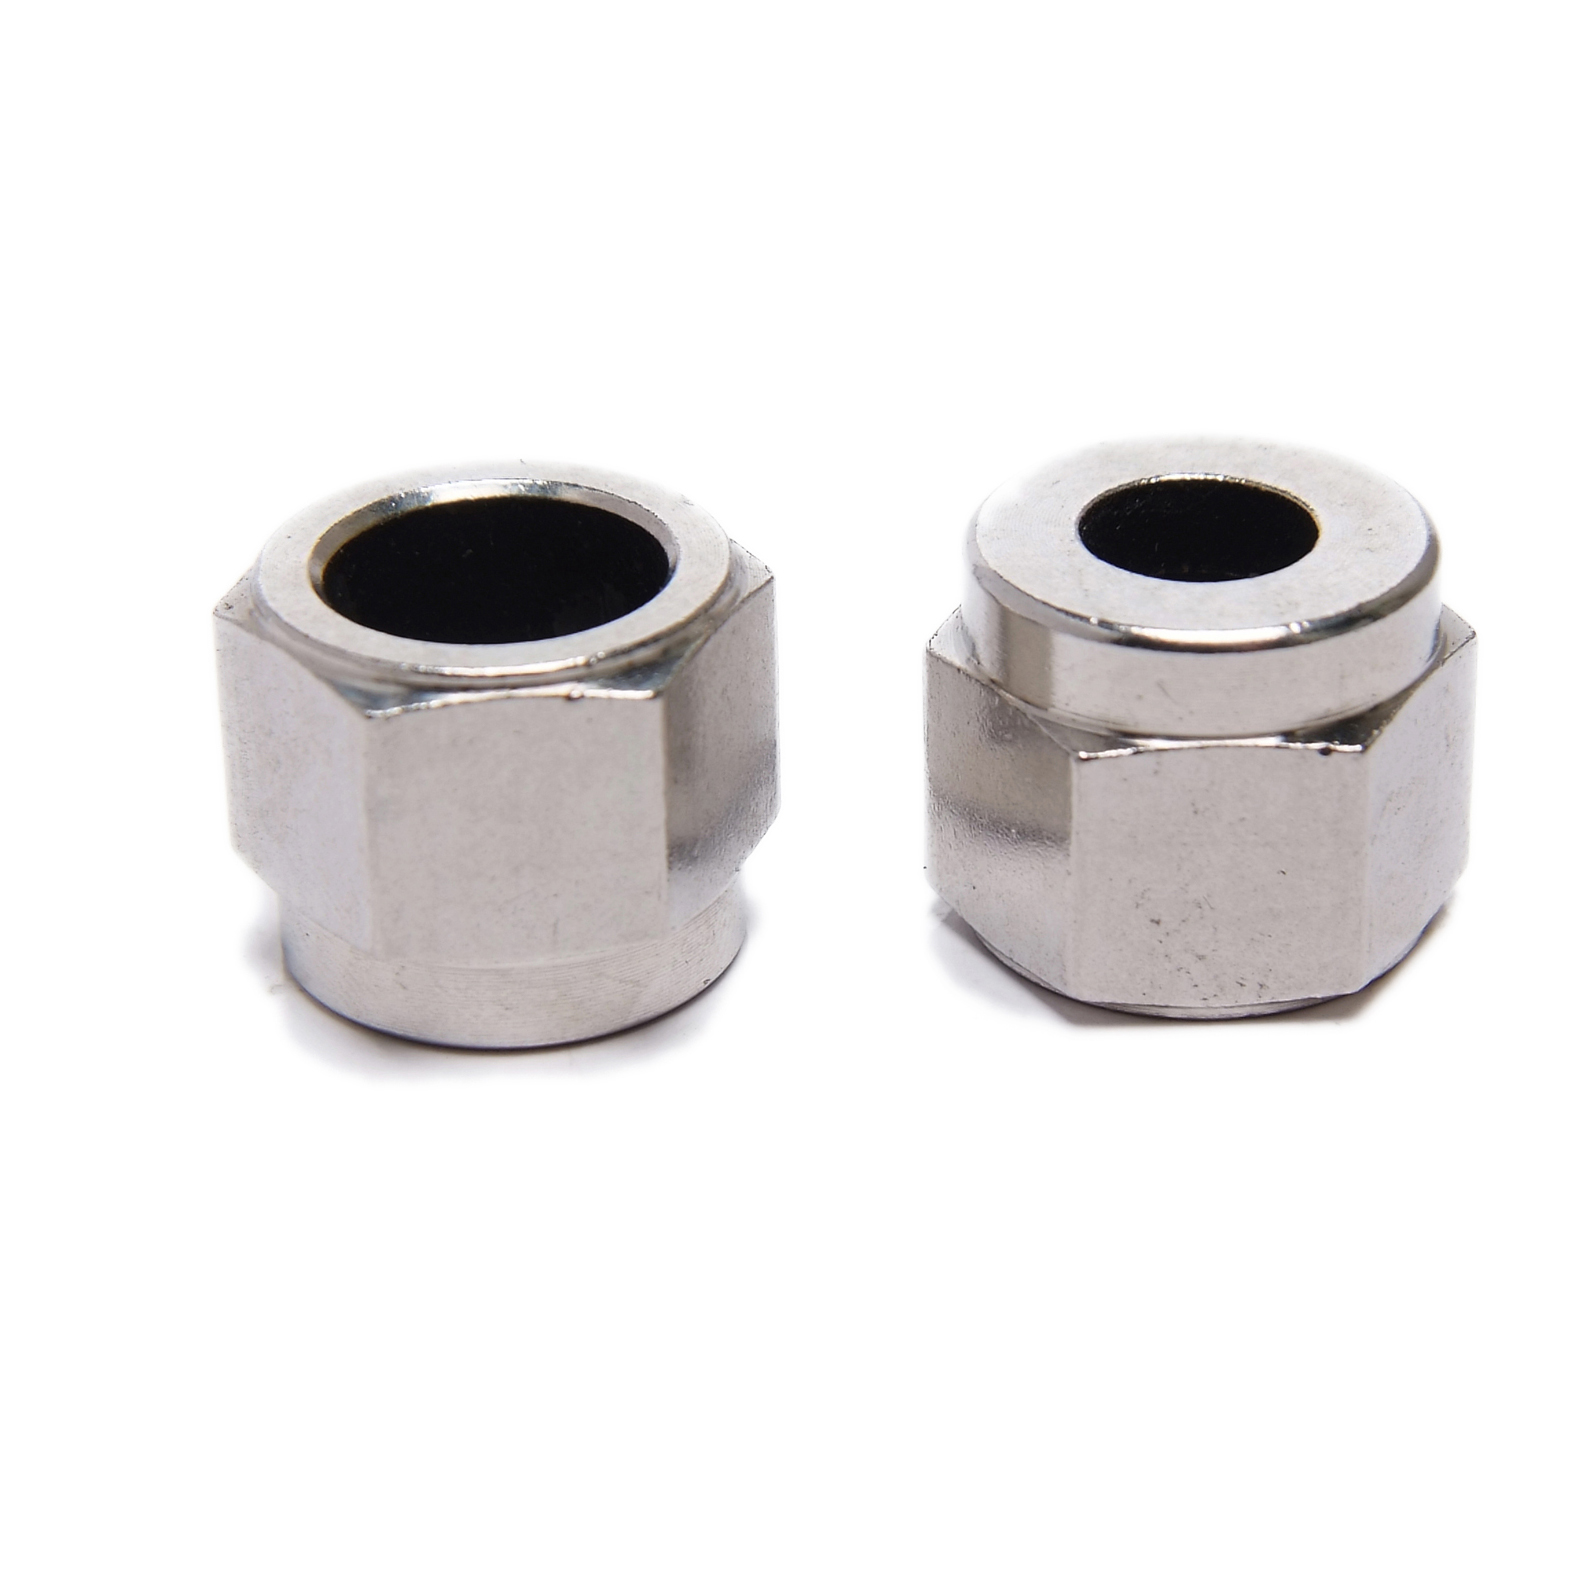 plain and black finish high tubular nuts